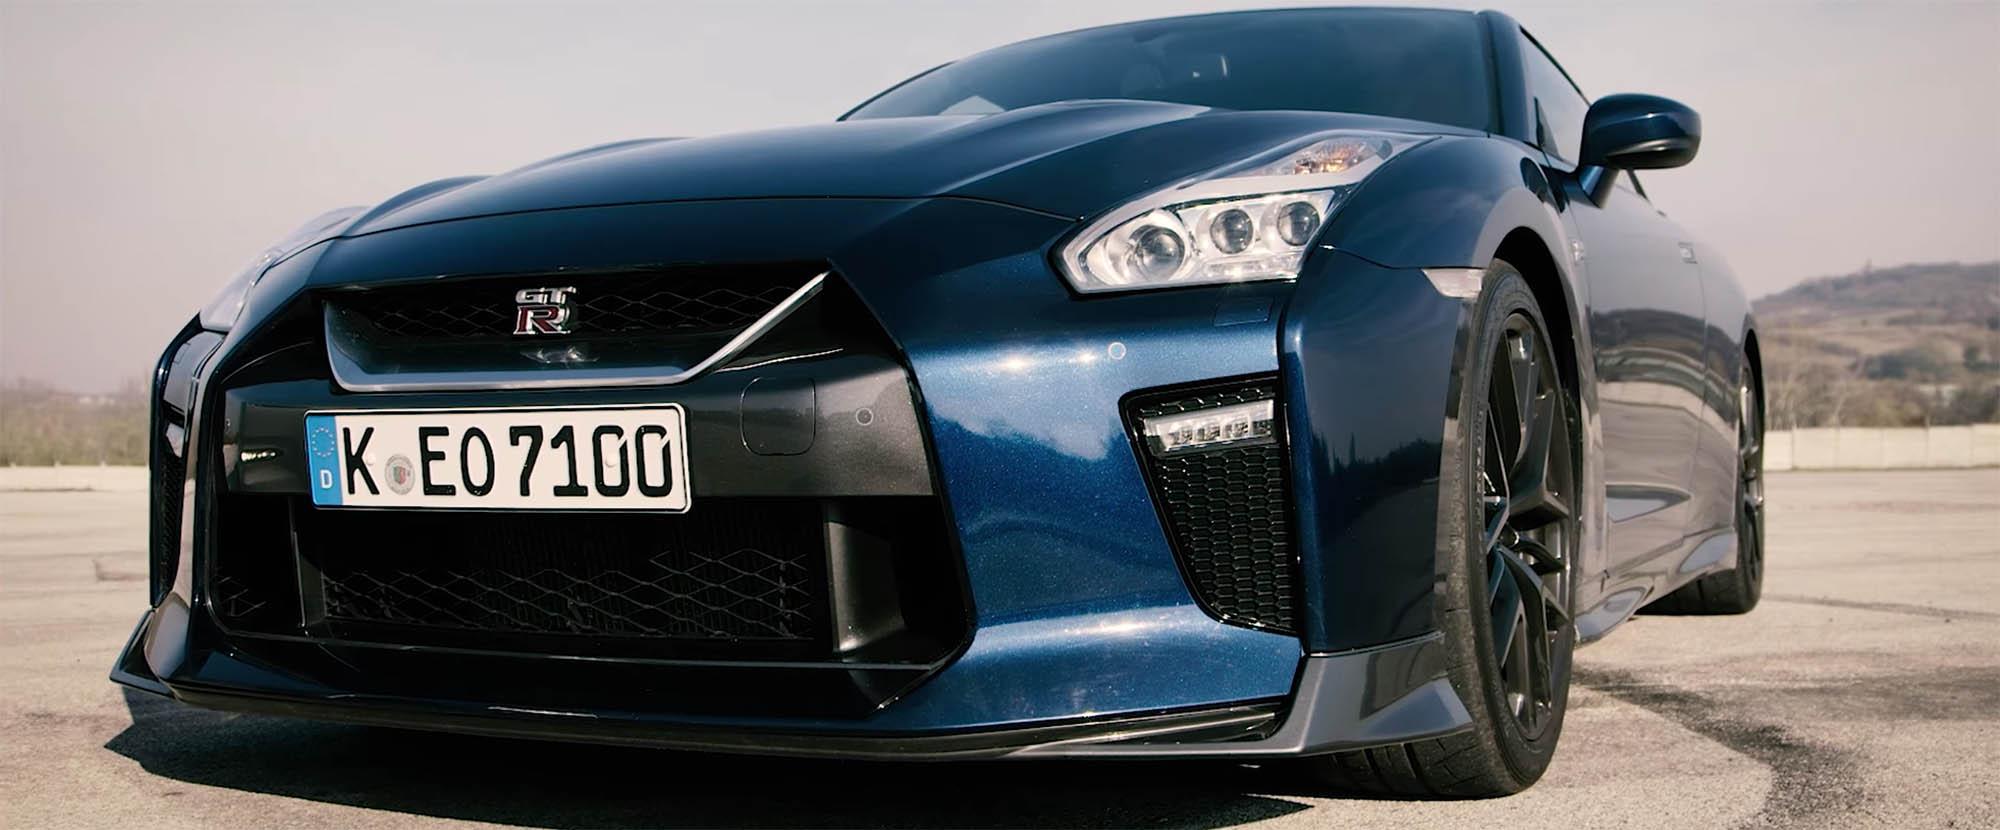 Nissan GT-R Black Edition 2017